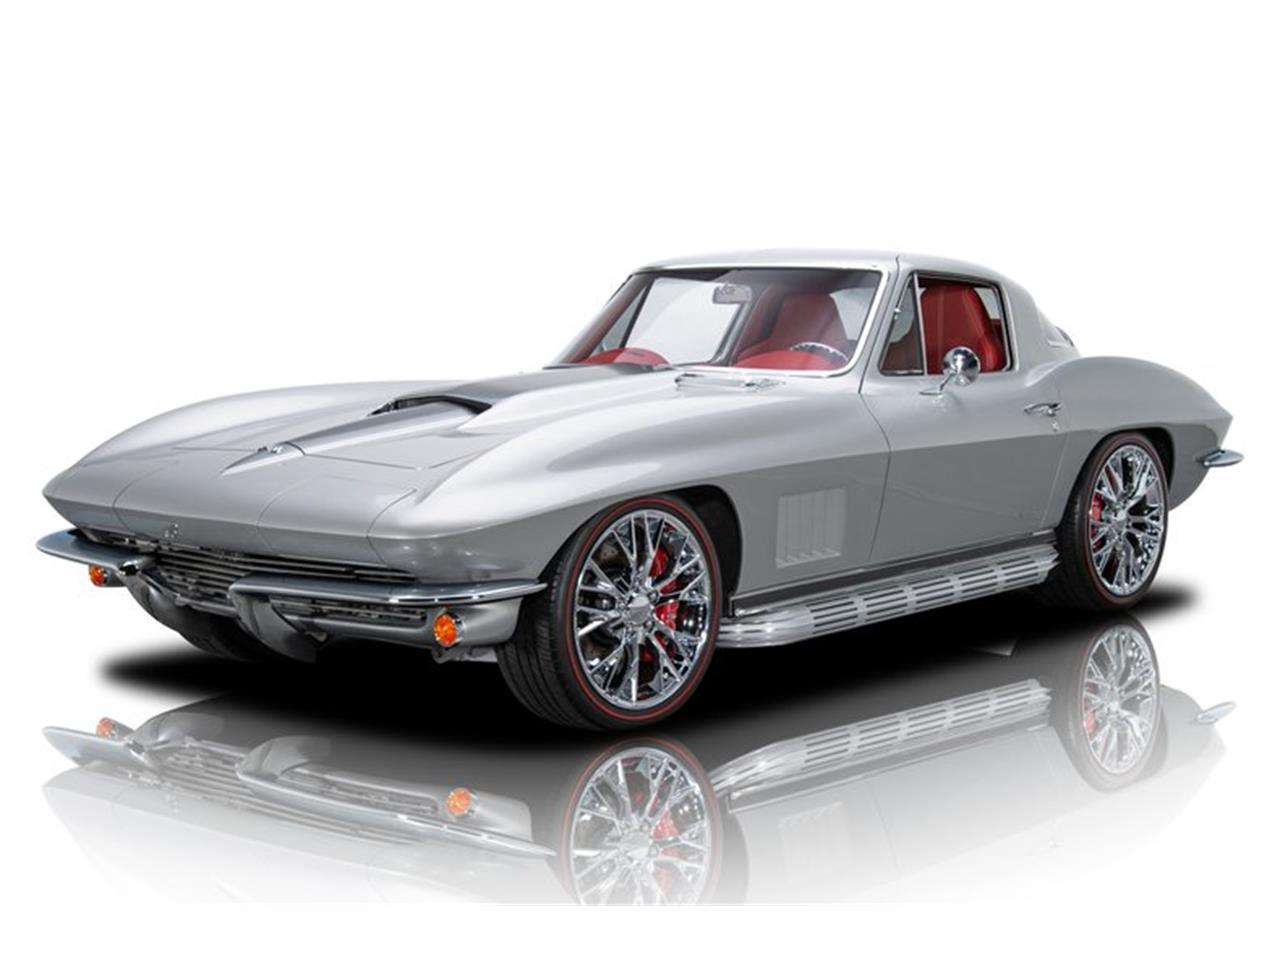 Large Picture of '67 Chevrolet Corvette located in North Carolina - Q4OM